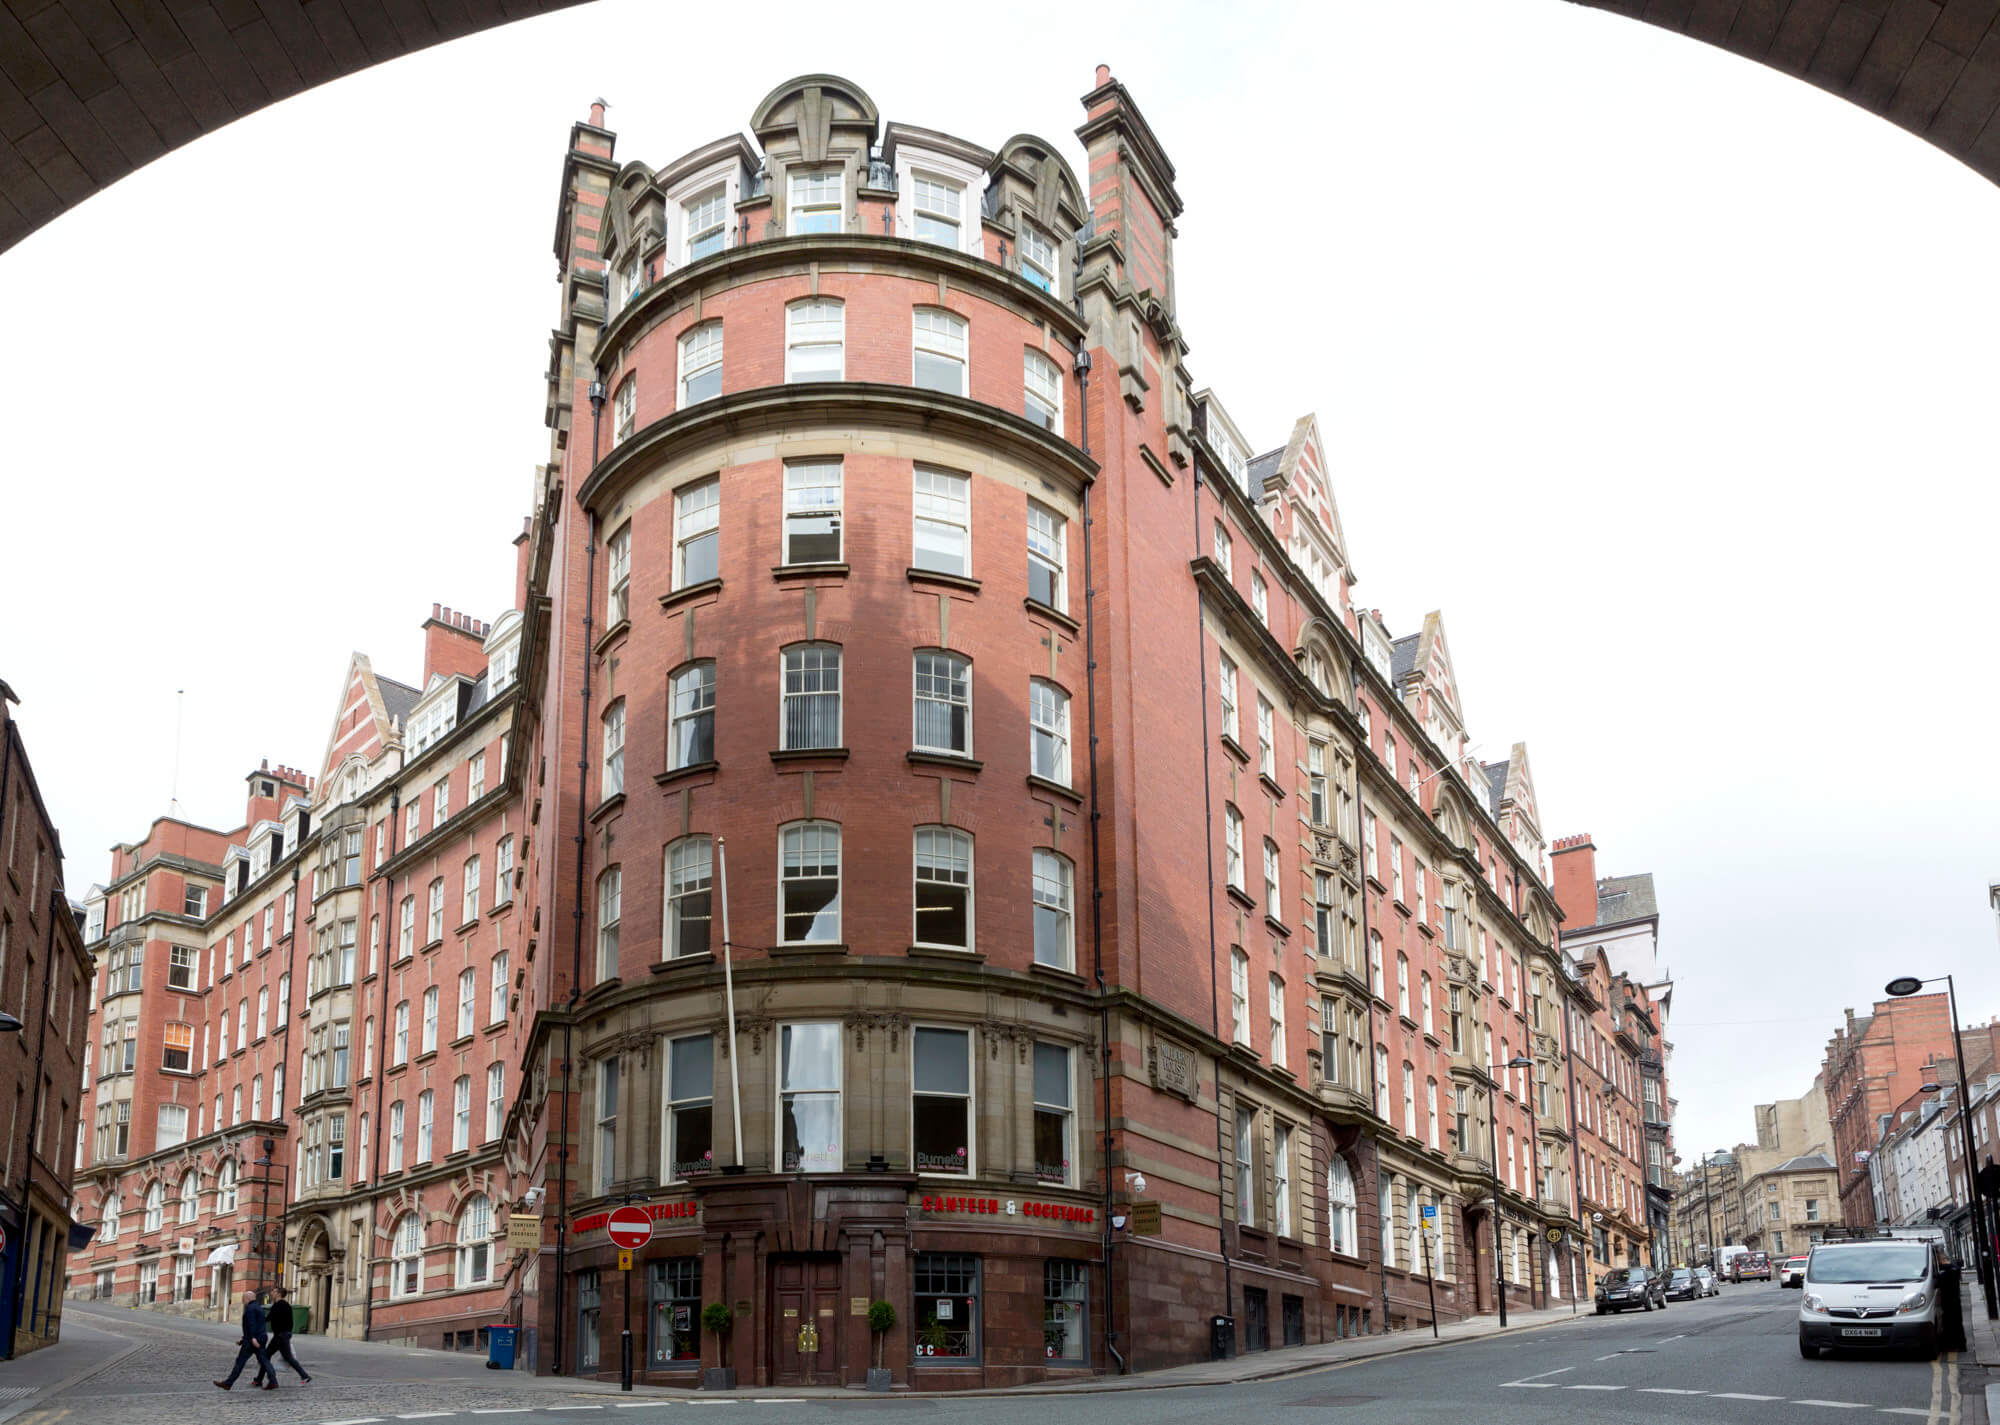 Dean Street, Newcastle Upon Tyne, NE1, North East